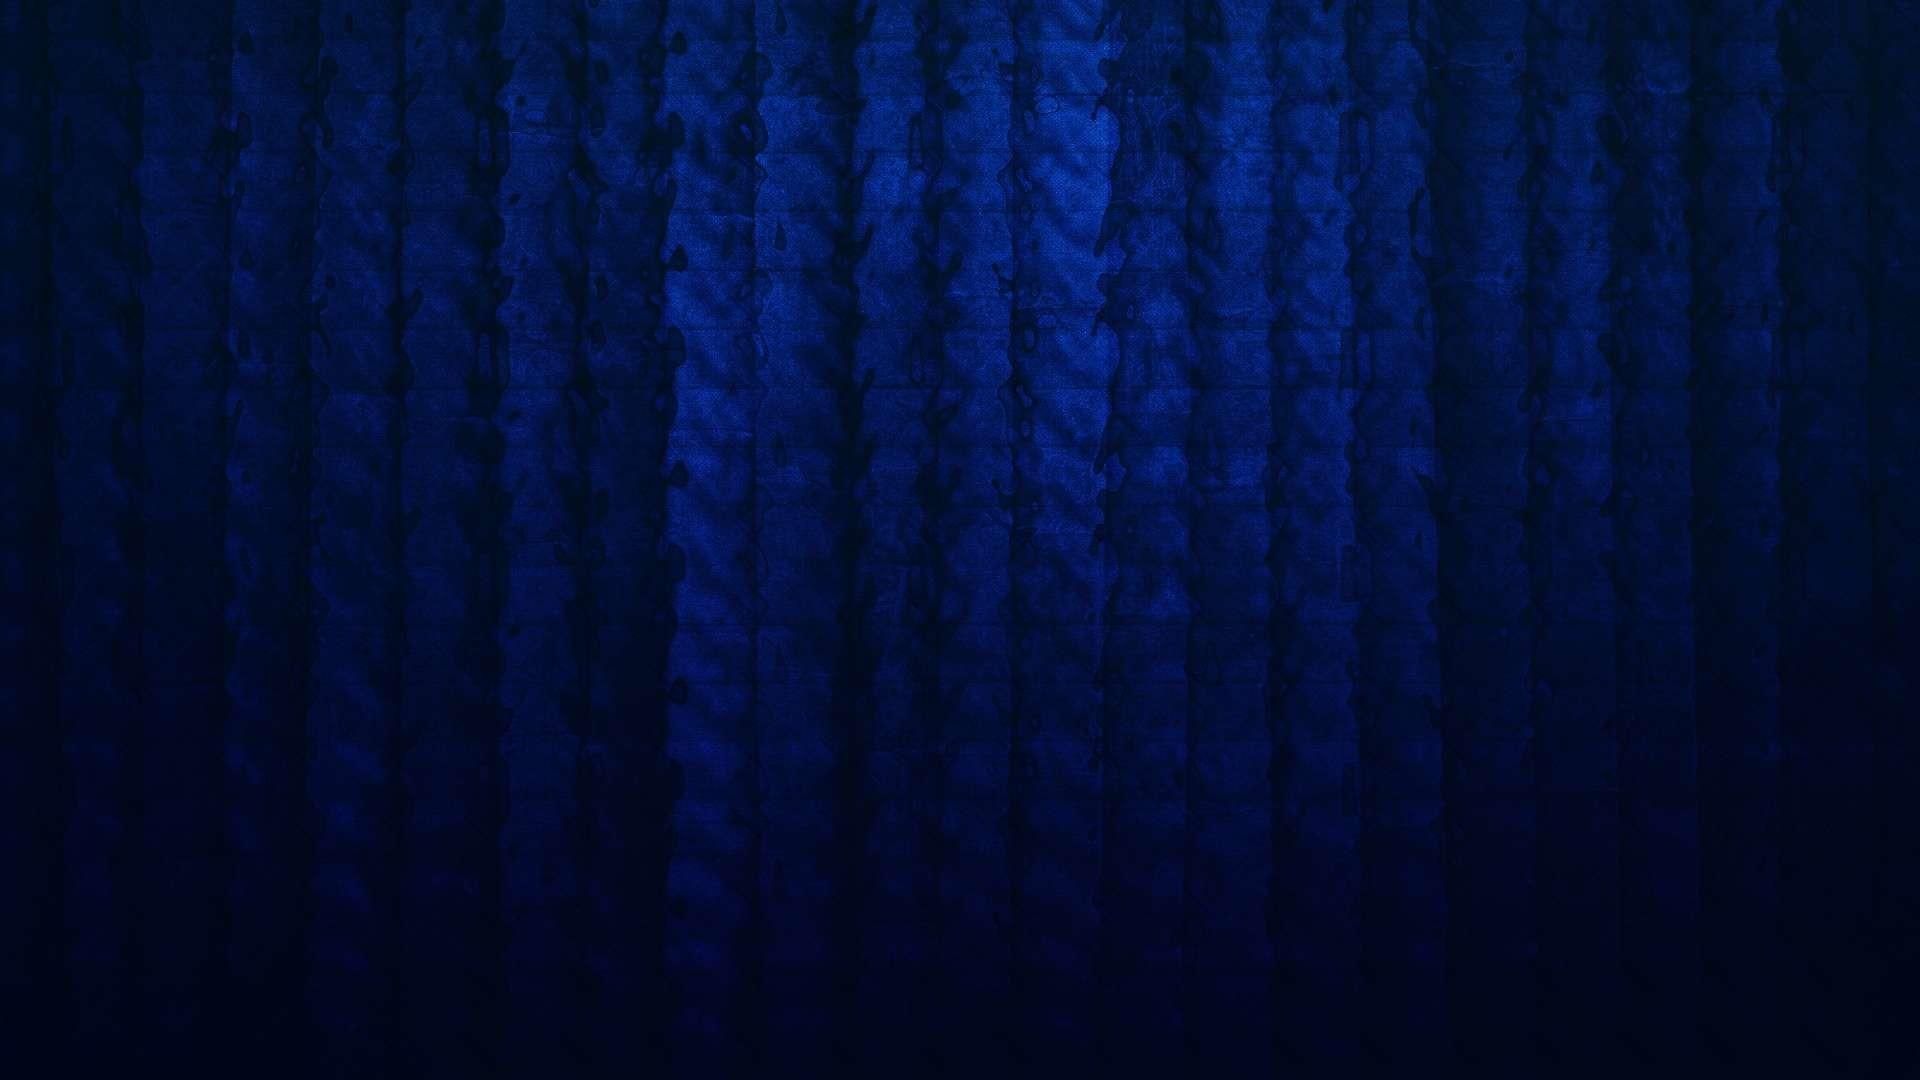 Wallpaper: Texture Blue Stripes Dark Hd Wallpaper 1080p. Upload at .